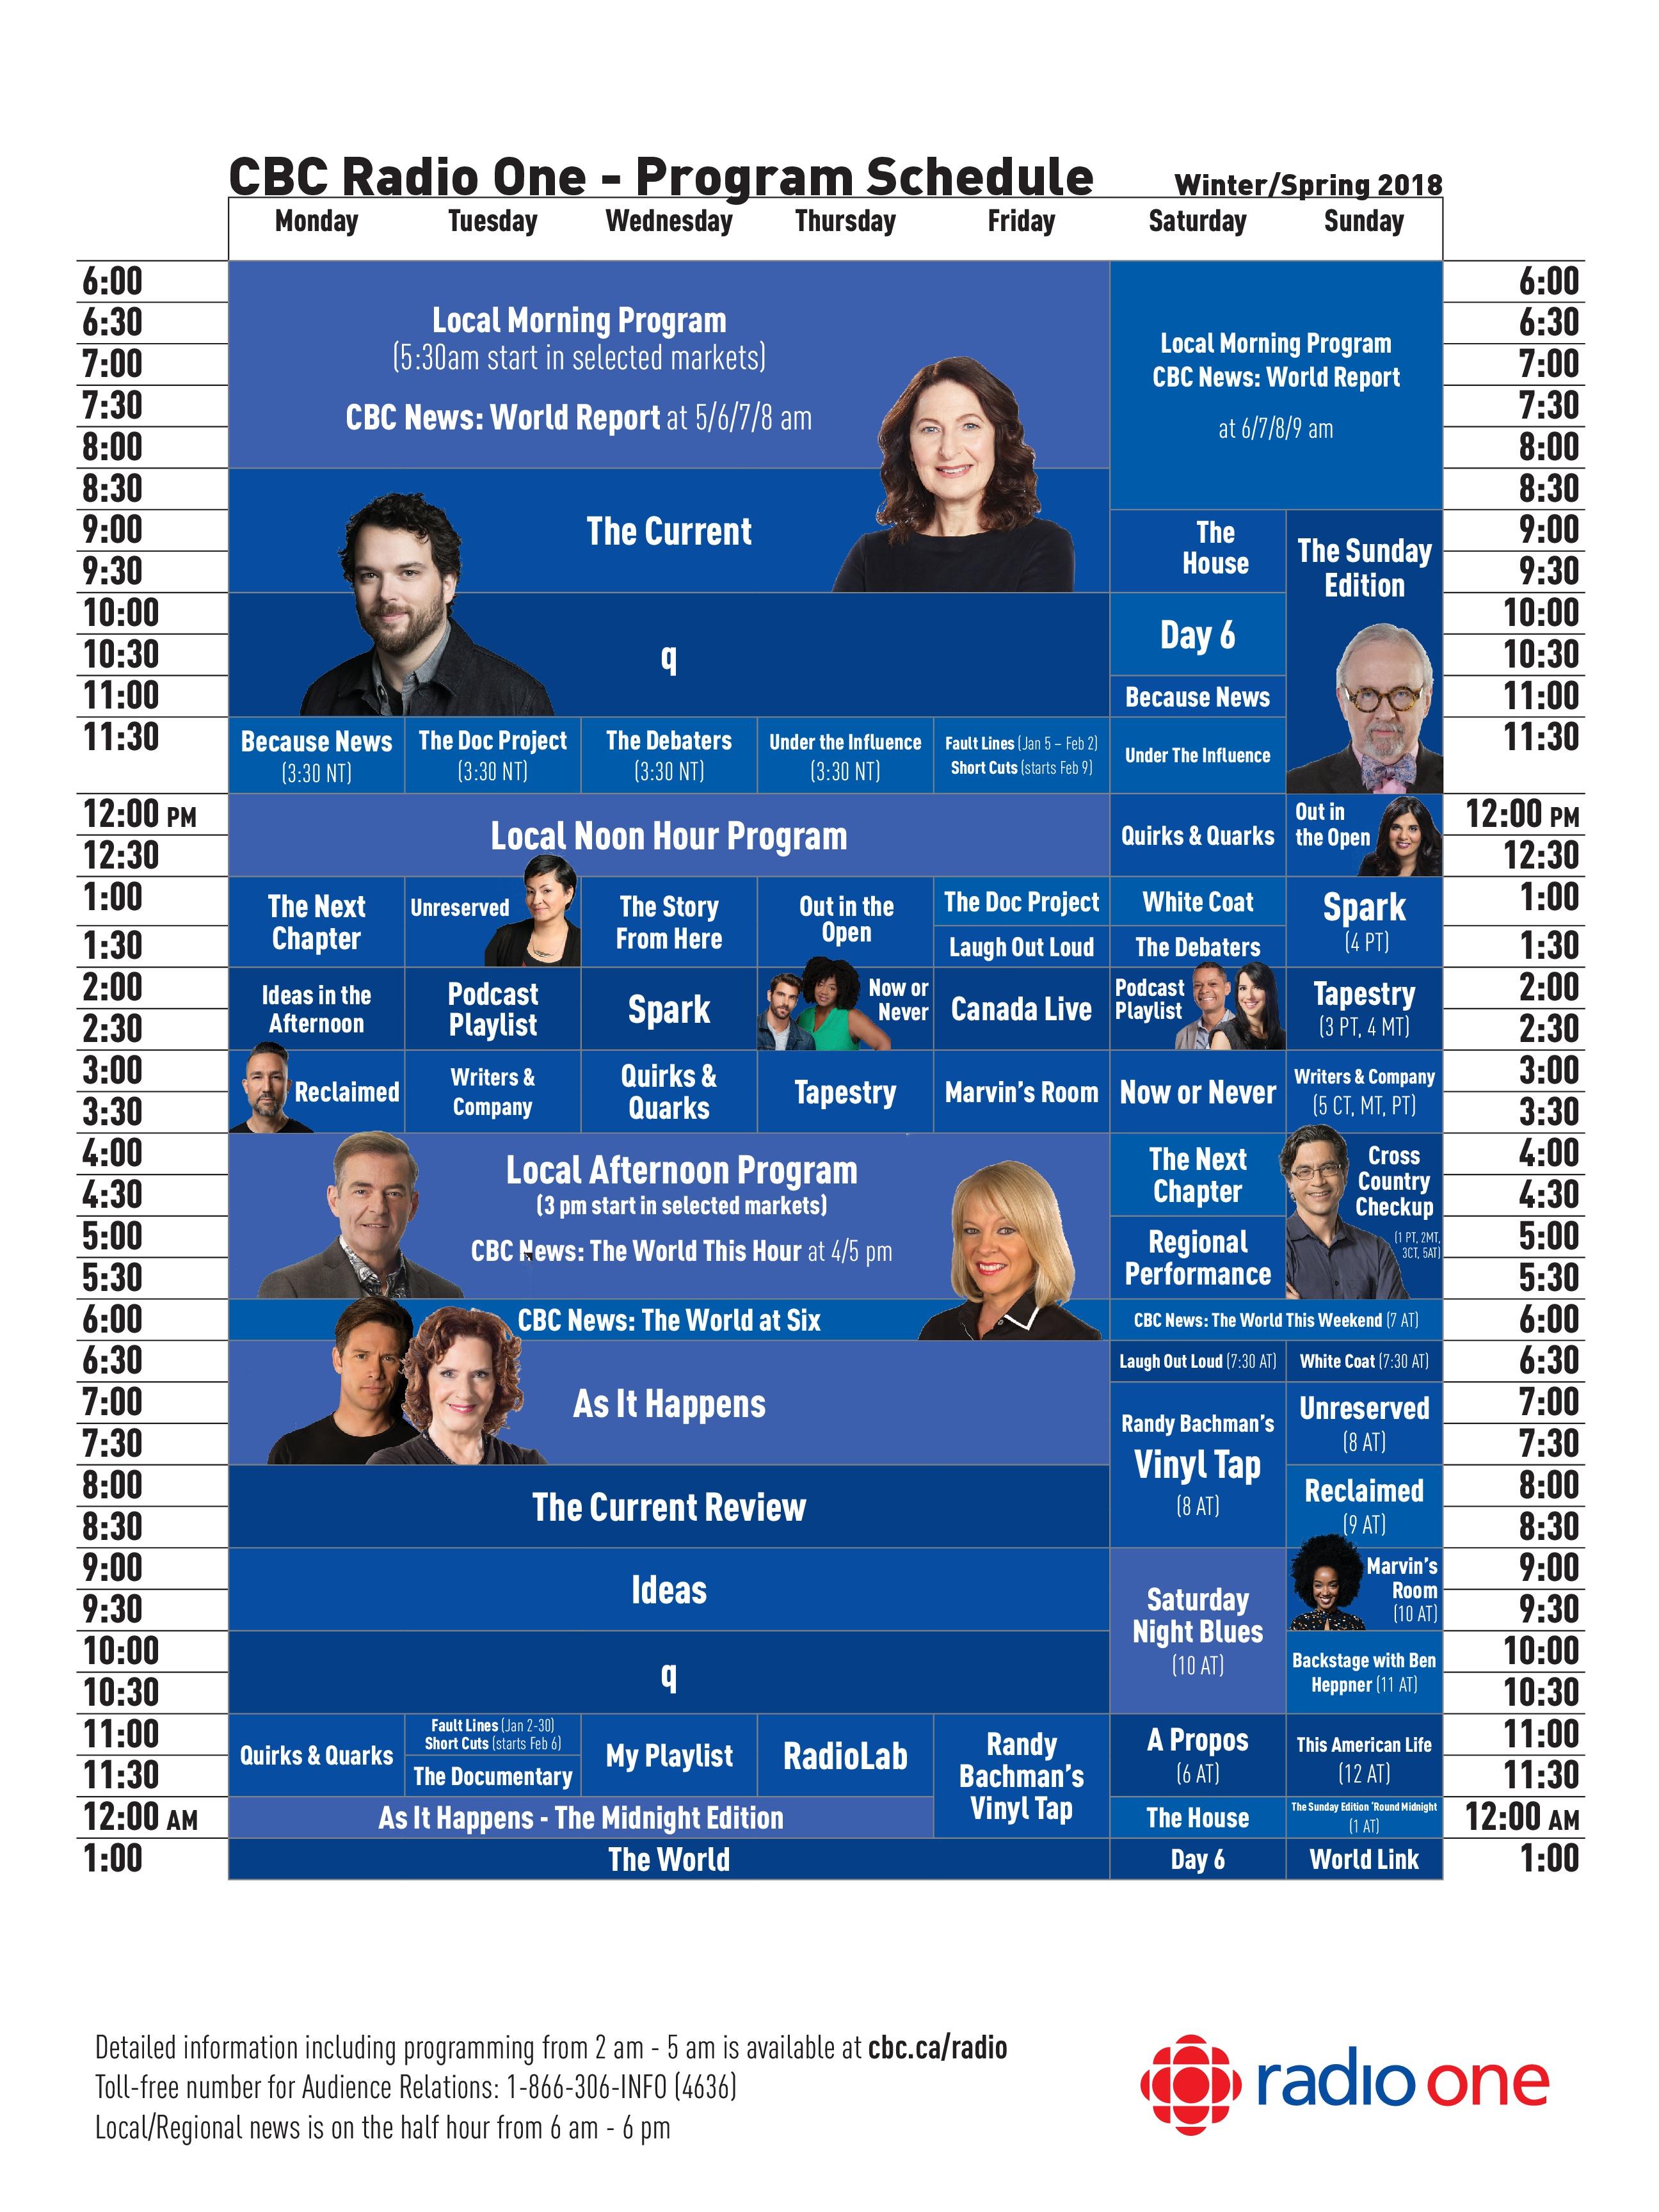 CBC Radio One Winter/Spring 2018 Schedule